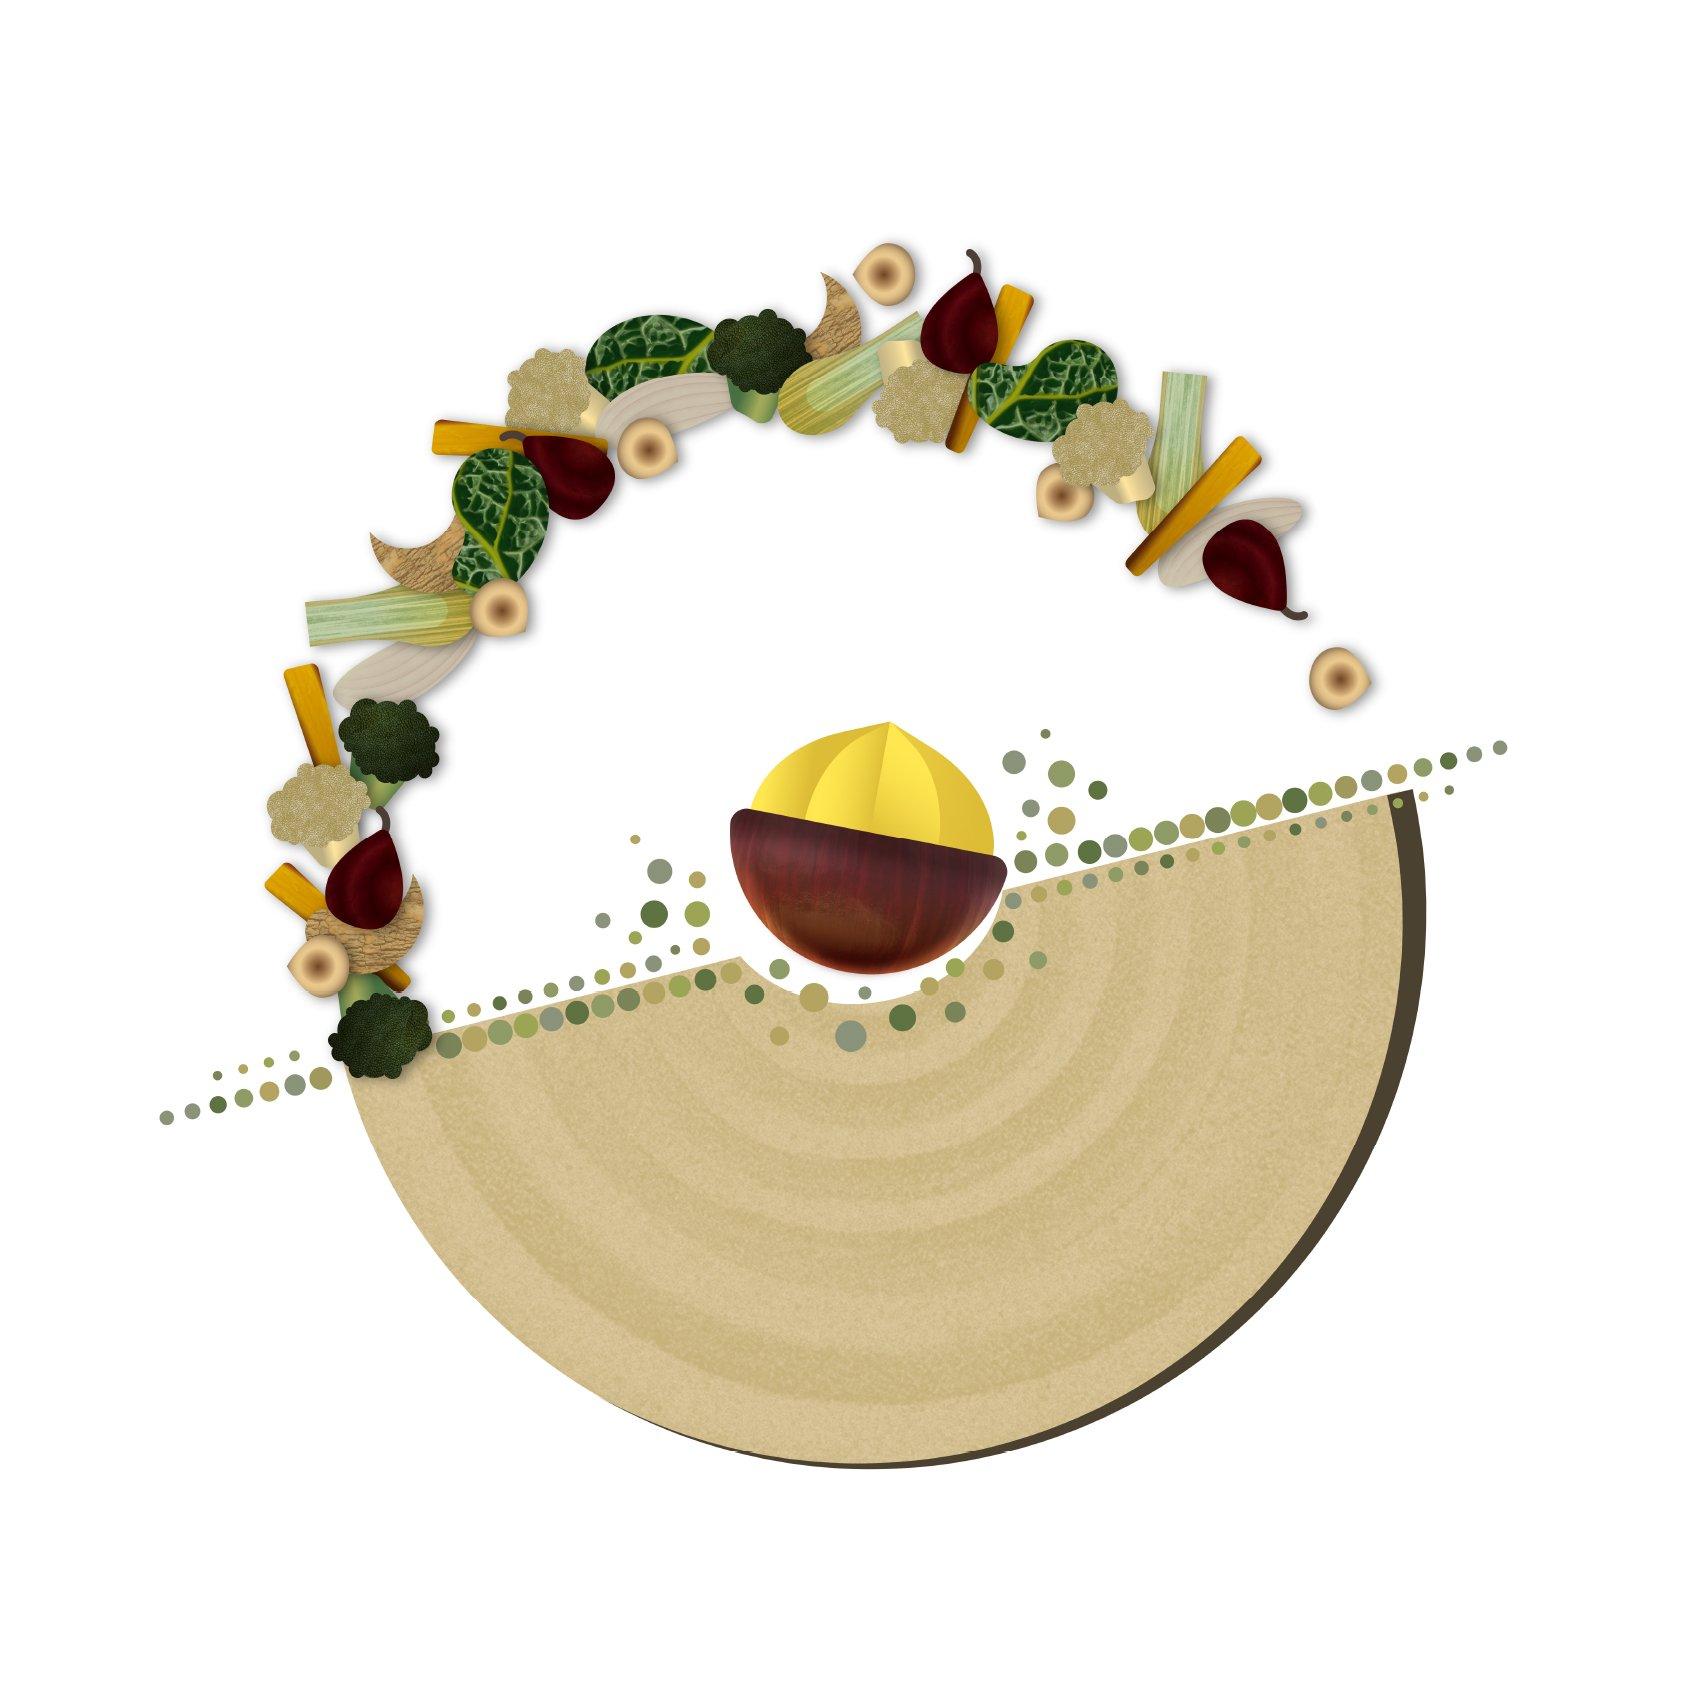 Sublime food design ricette in cibografica 22